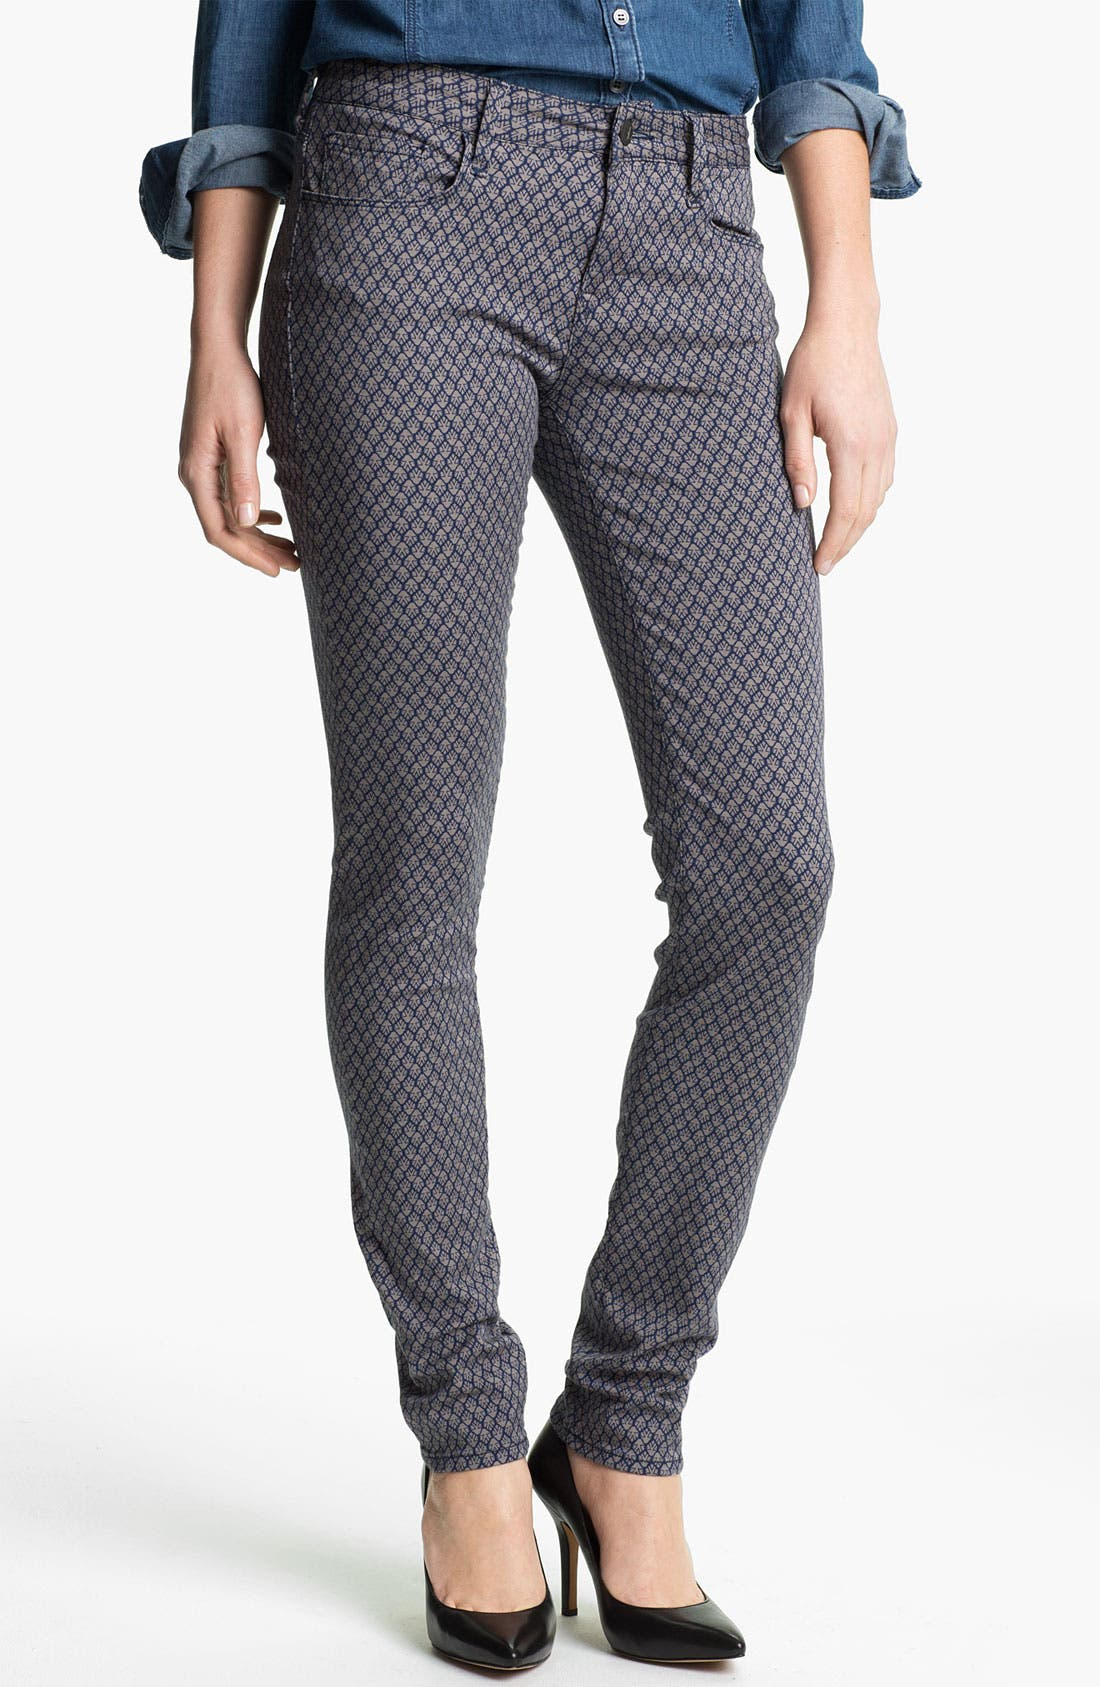 Main Image - Mavi Jeans 'Alexa' Geometric Print Skinny Jeans (Online Exclusive)